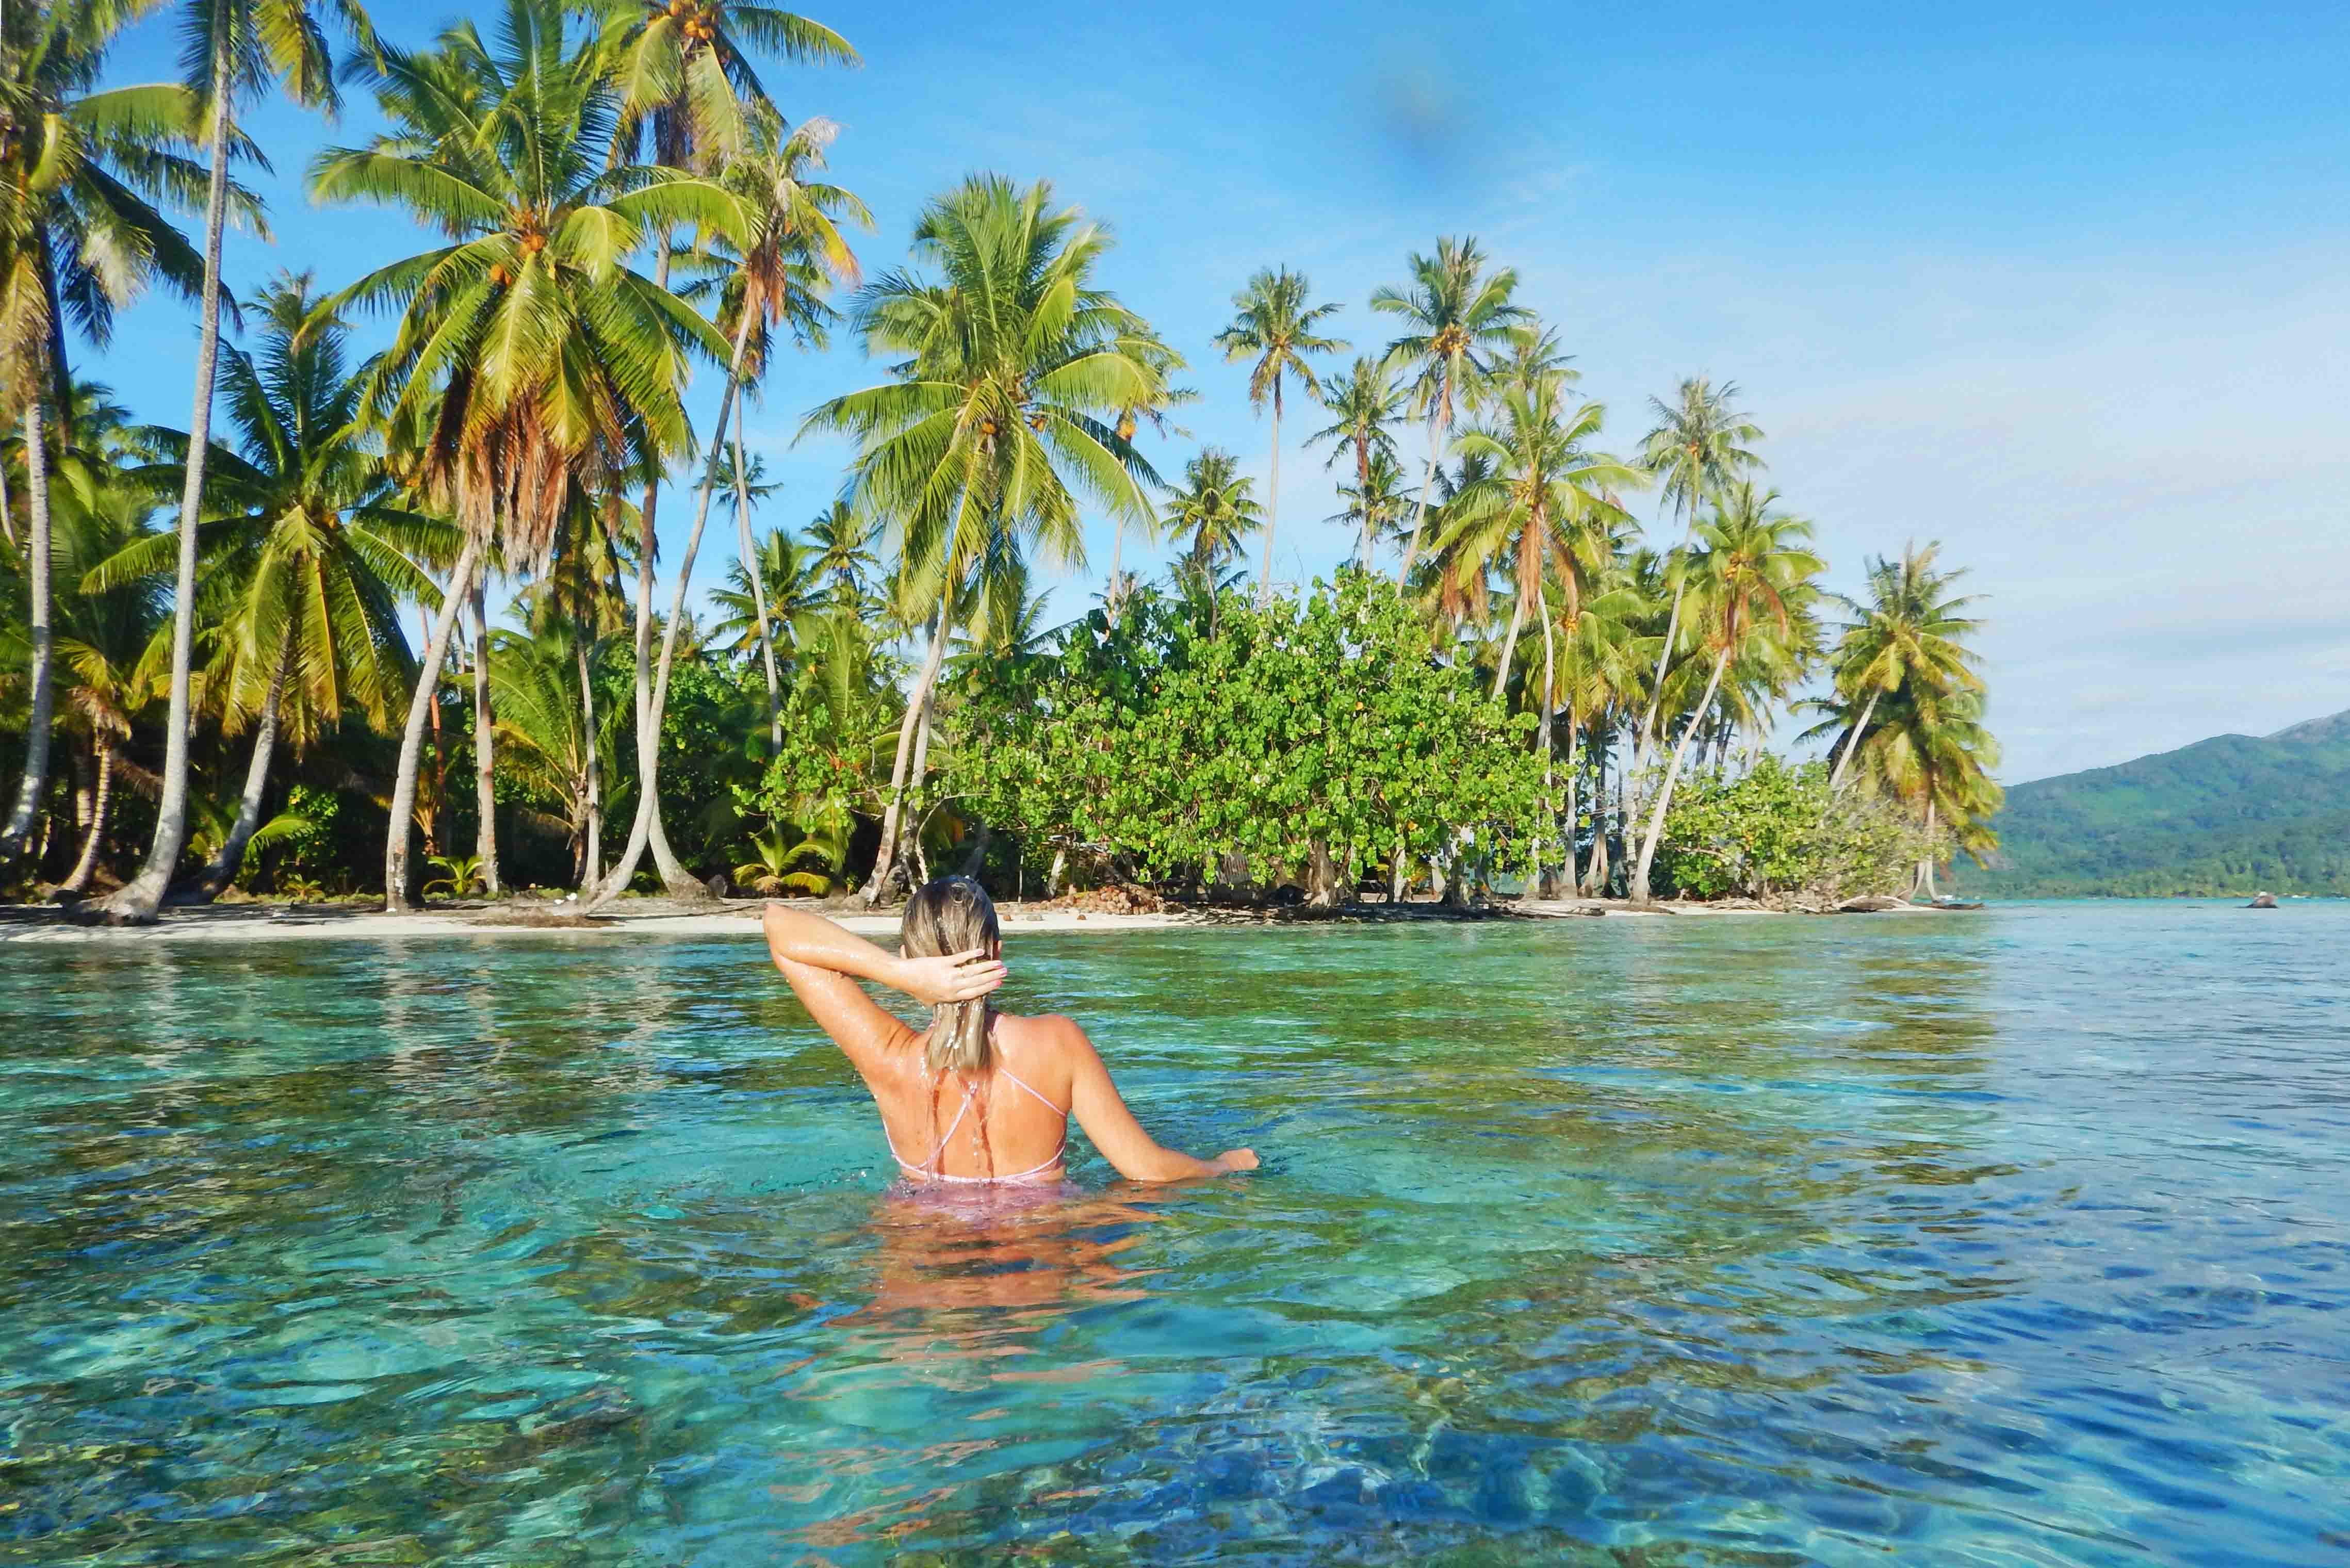 snorkel-le-tahaa-island-french-polynesia-tahiti